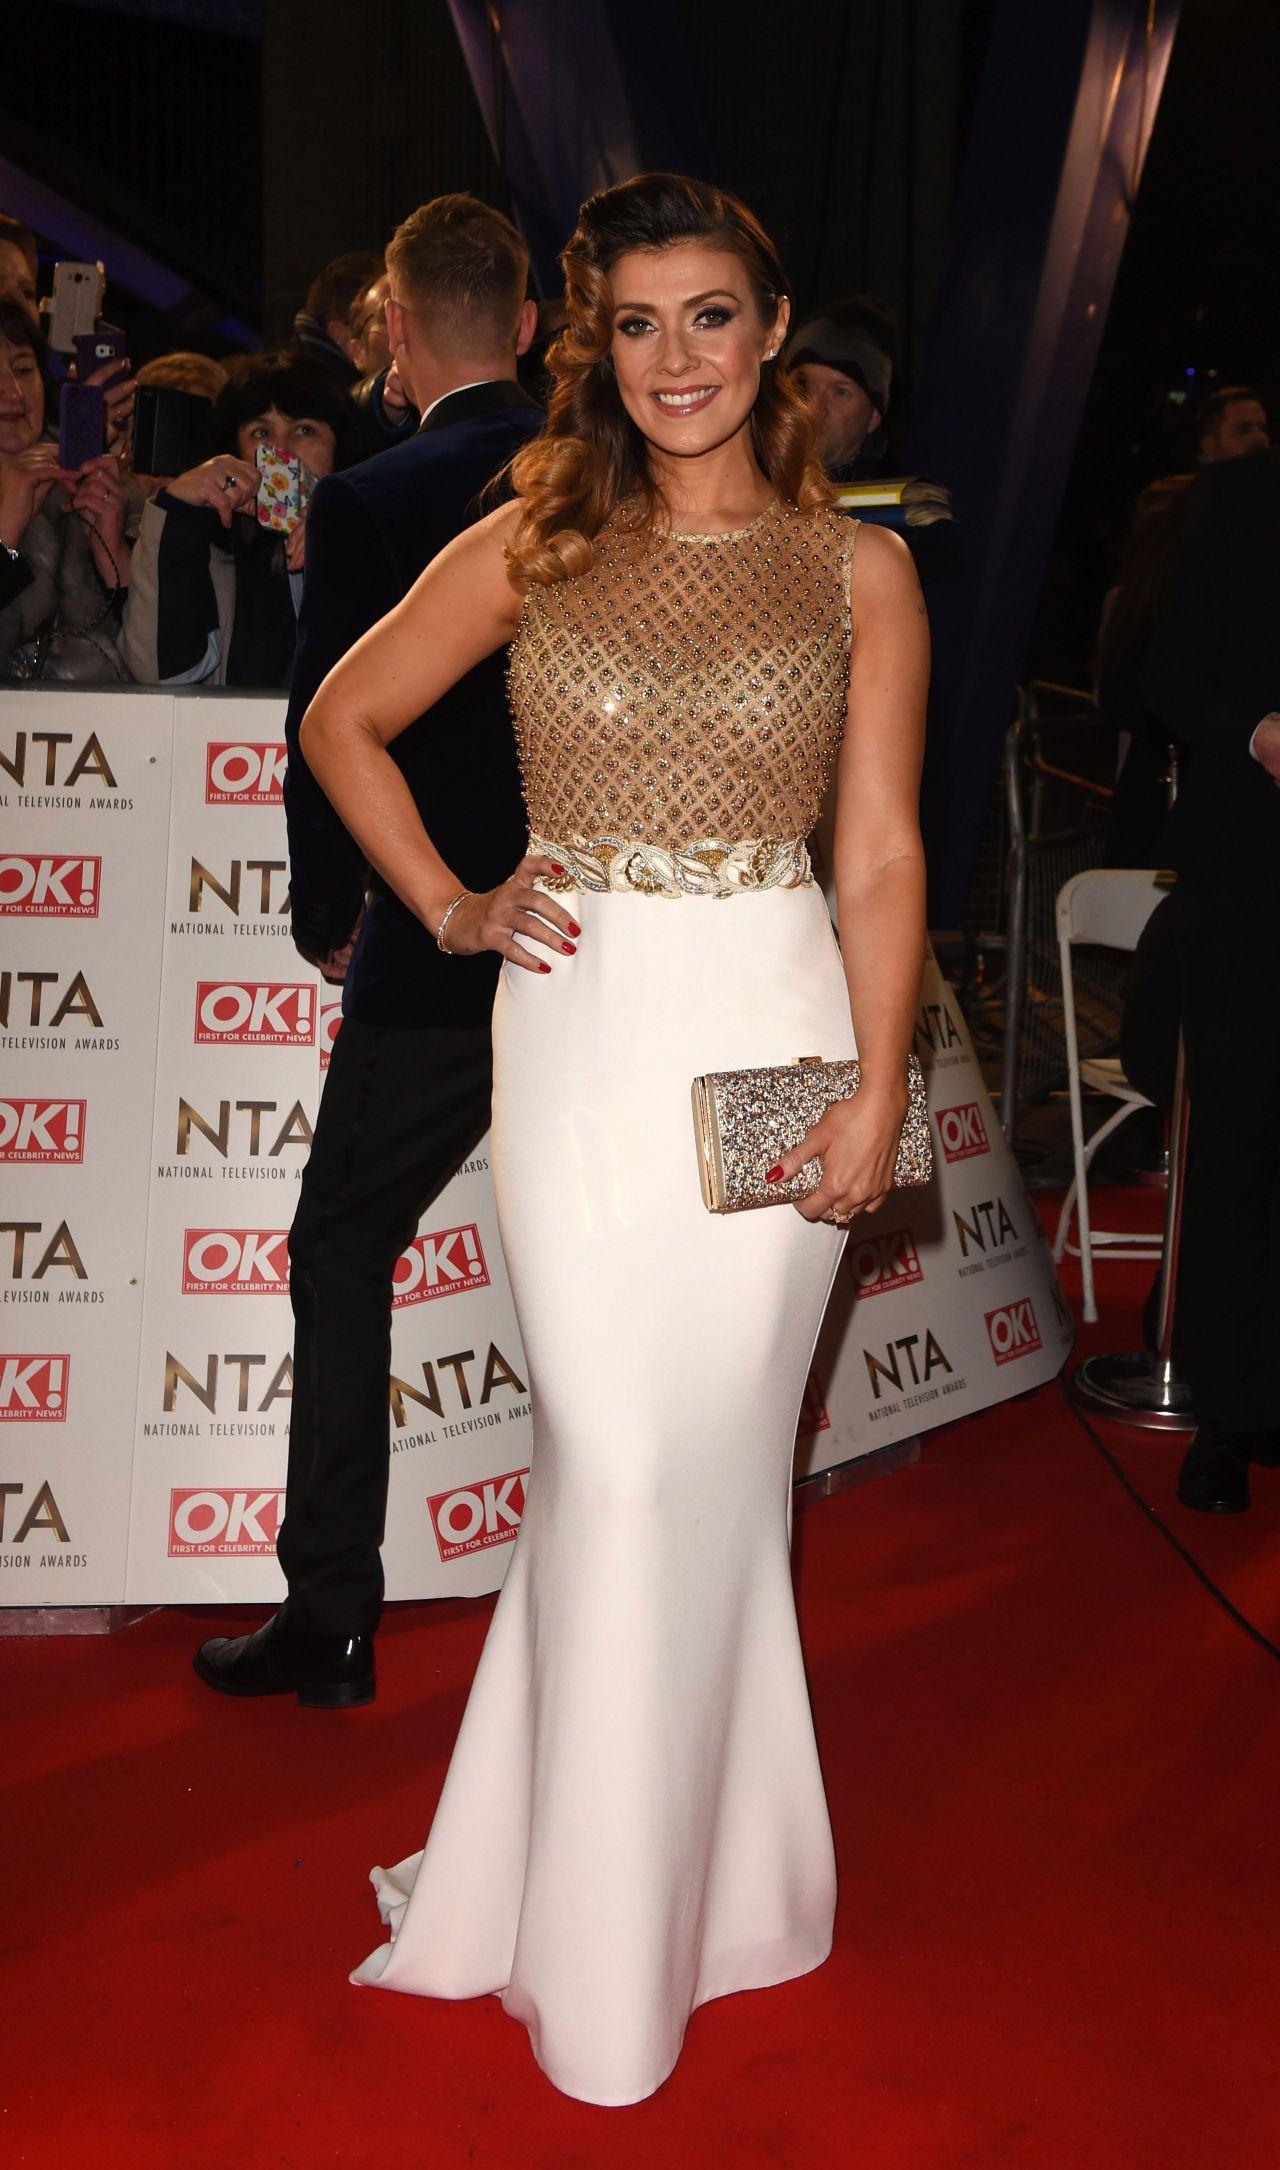 Kym Marsh National Television Awards In London 1 25 2017